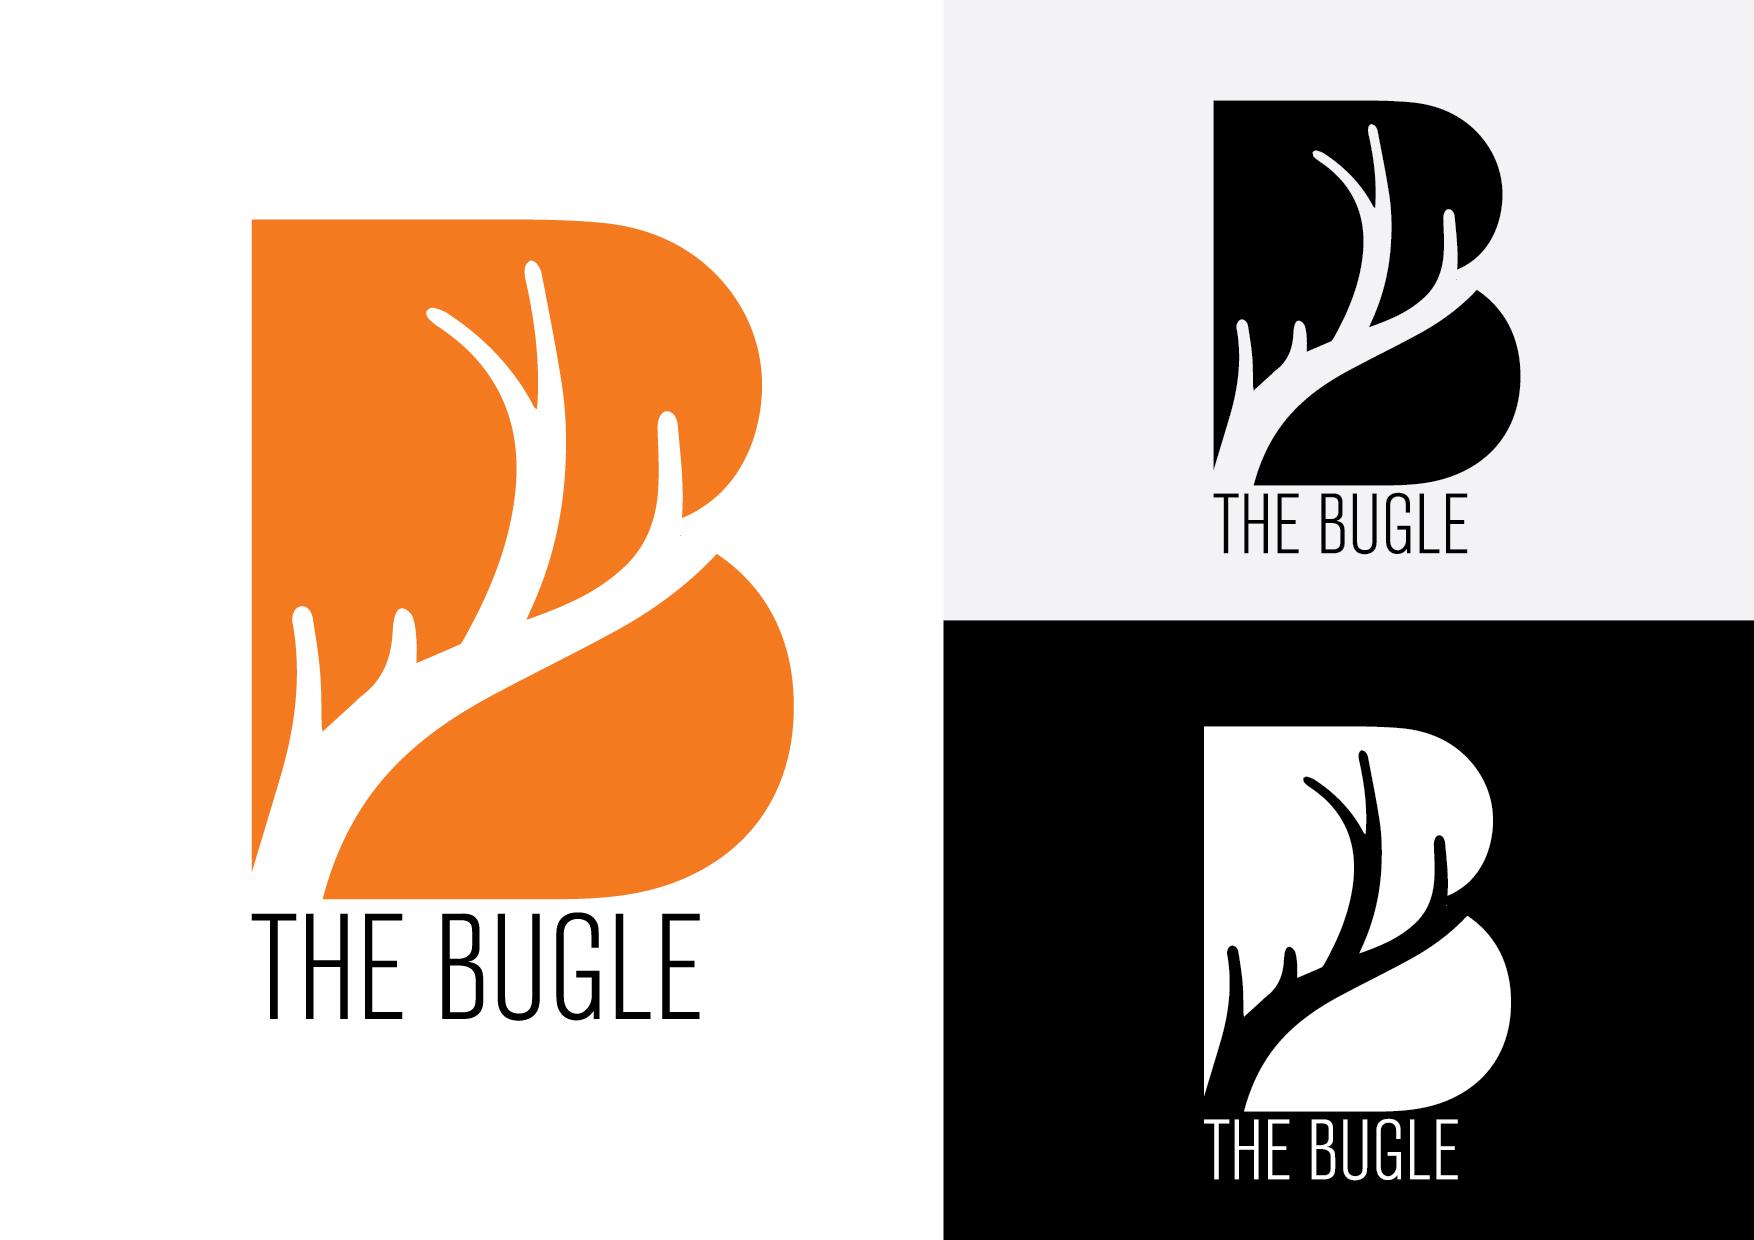 The_bugle-01